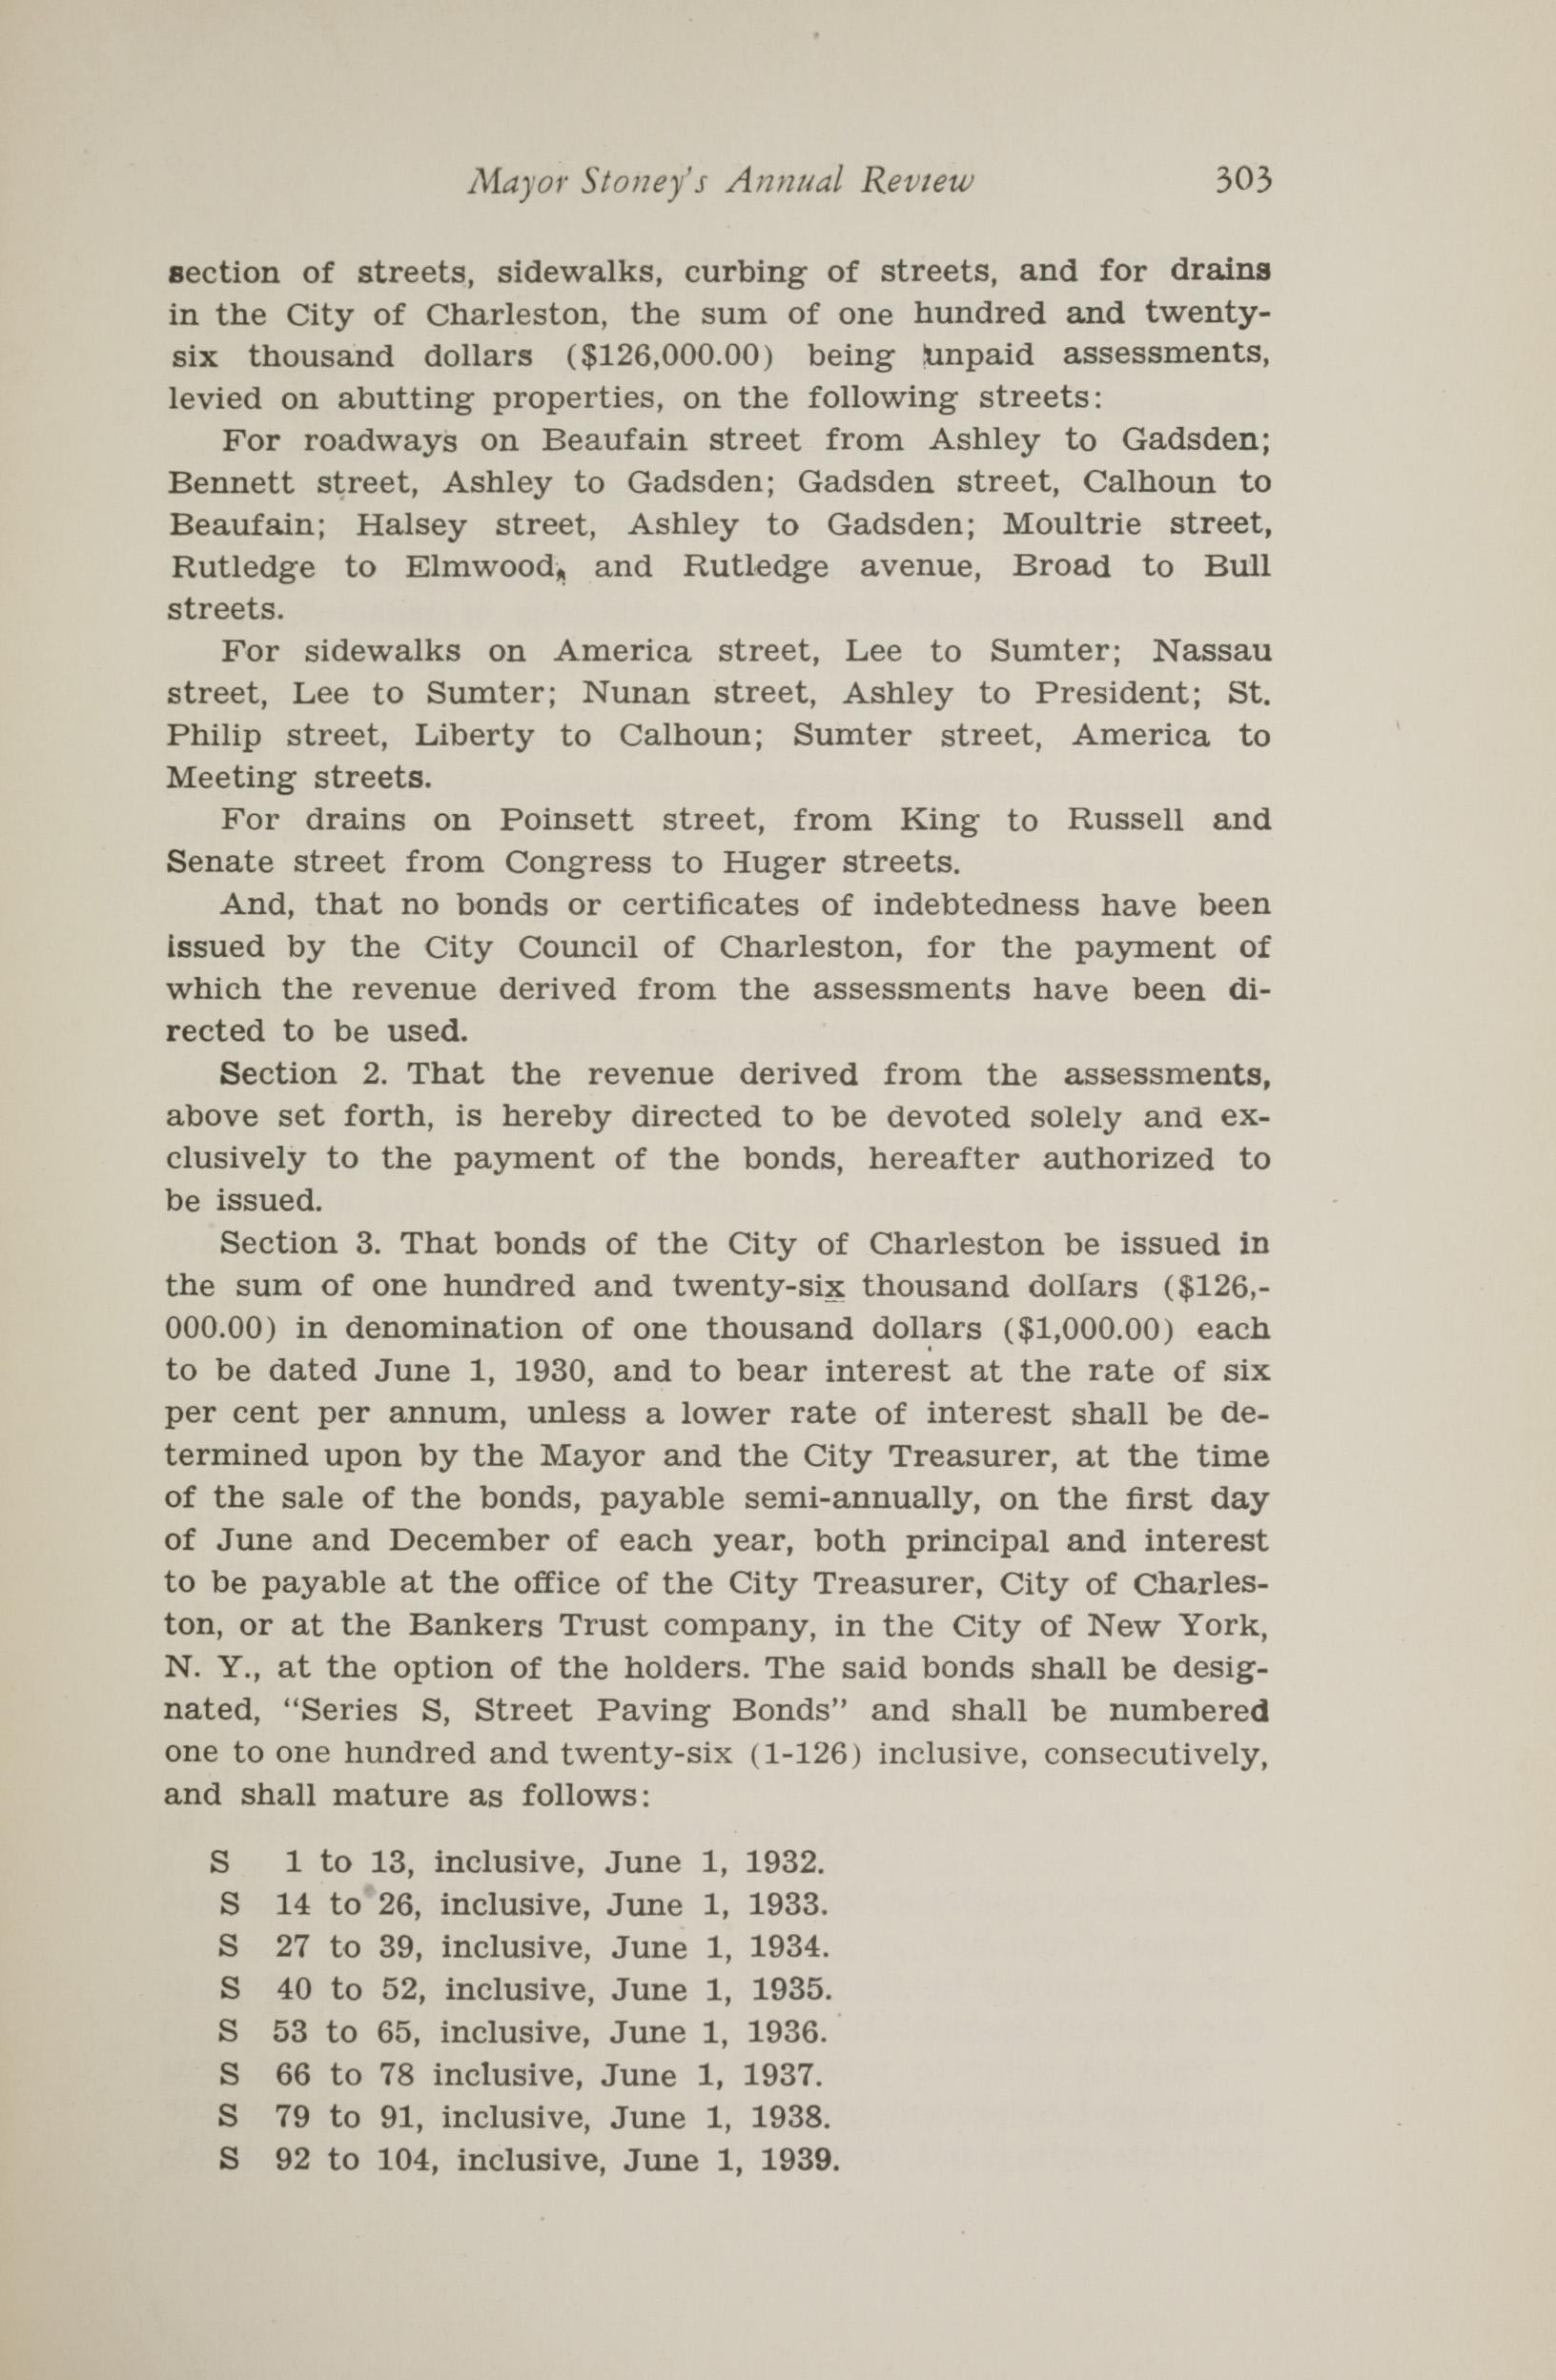 Charleston Yearbook, 1930, page 303